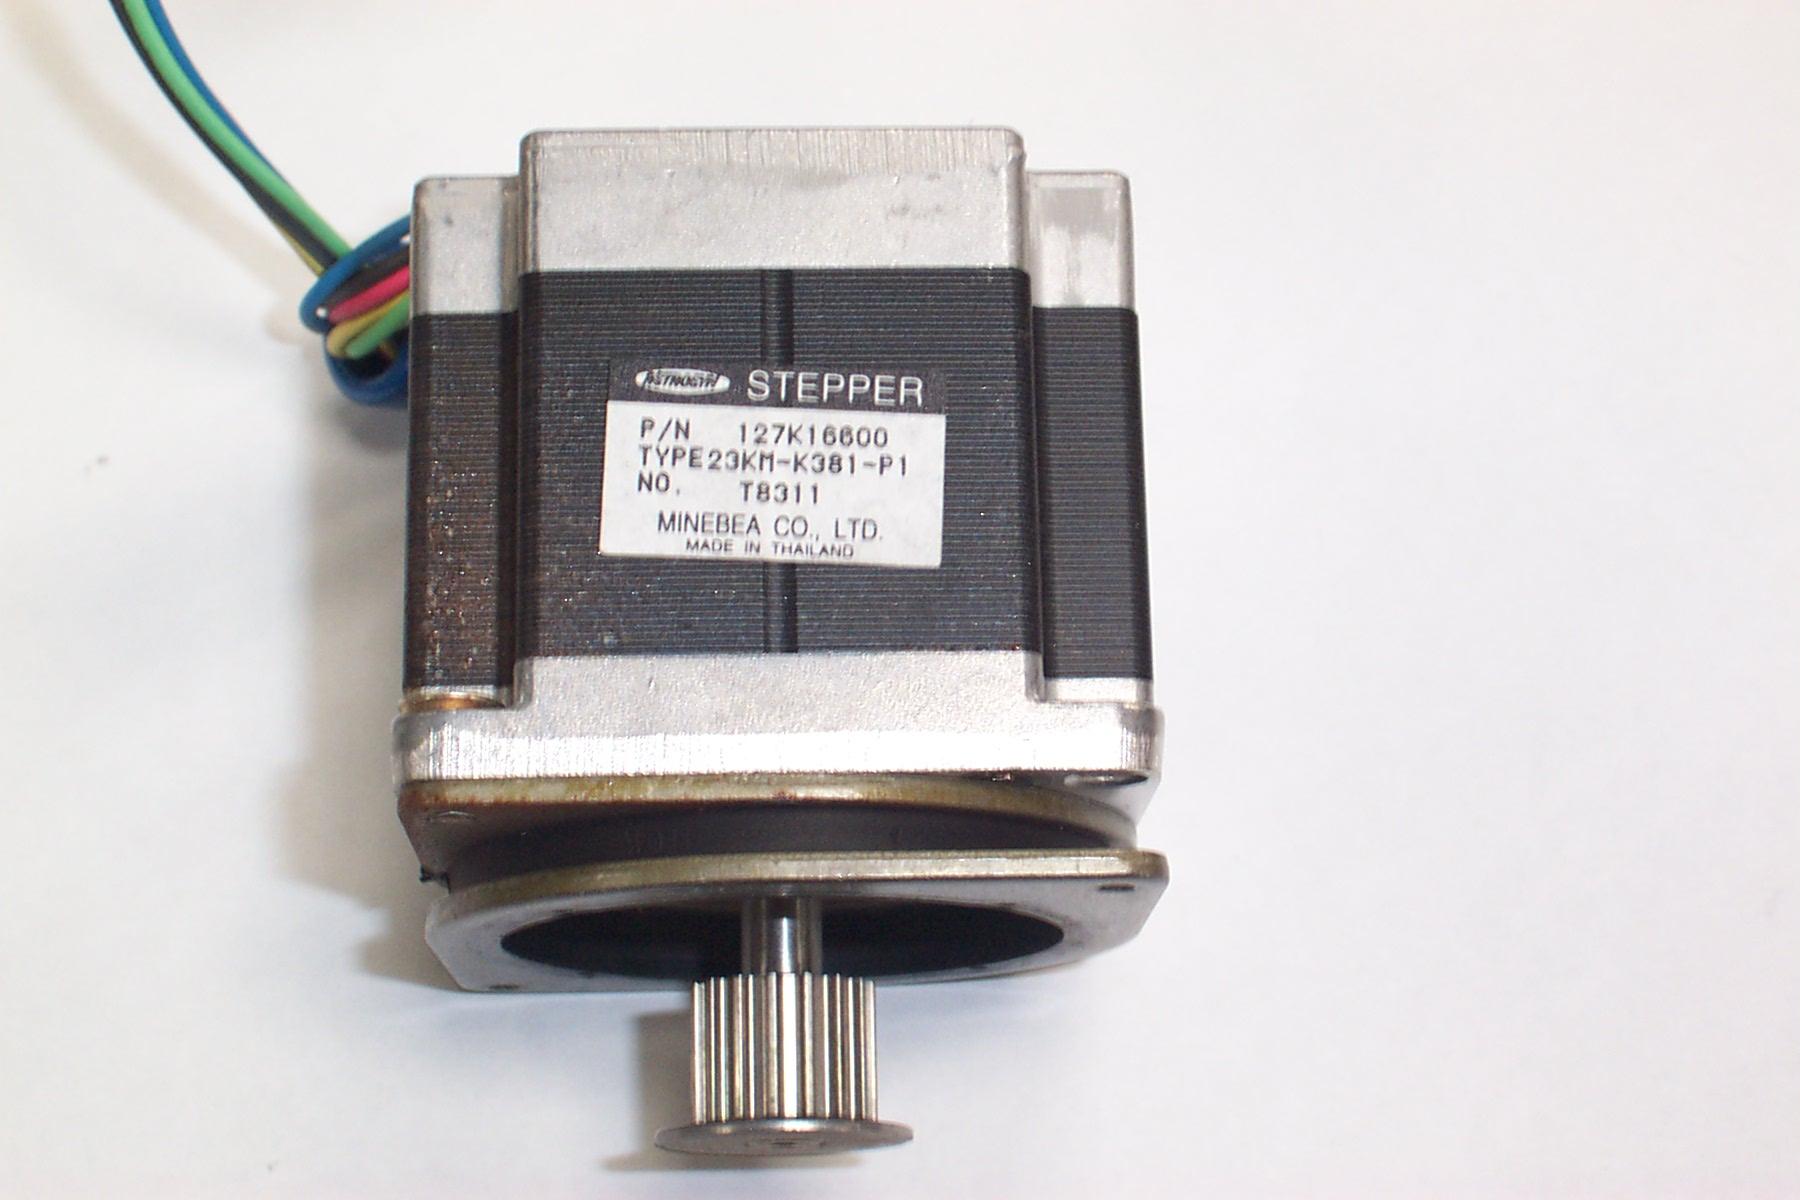 Minebea 23km K381 P1 Stepper Motor Ebay